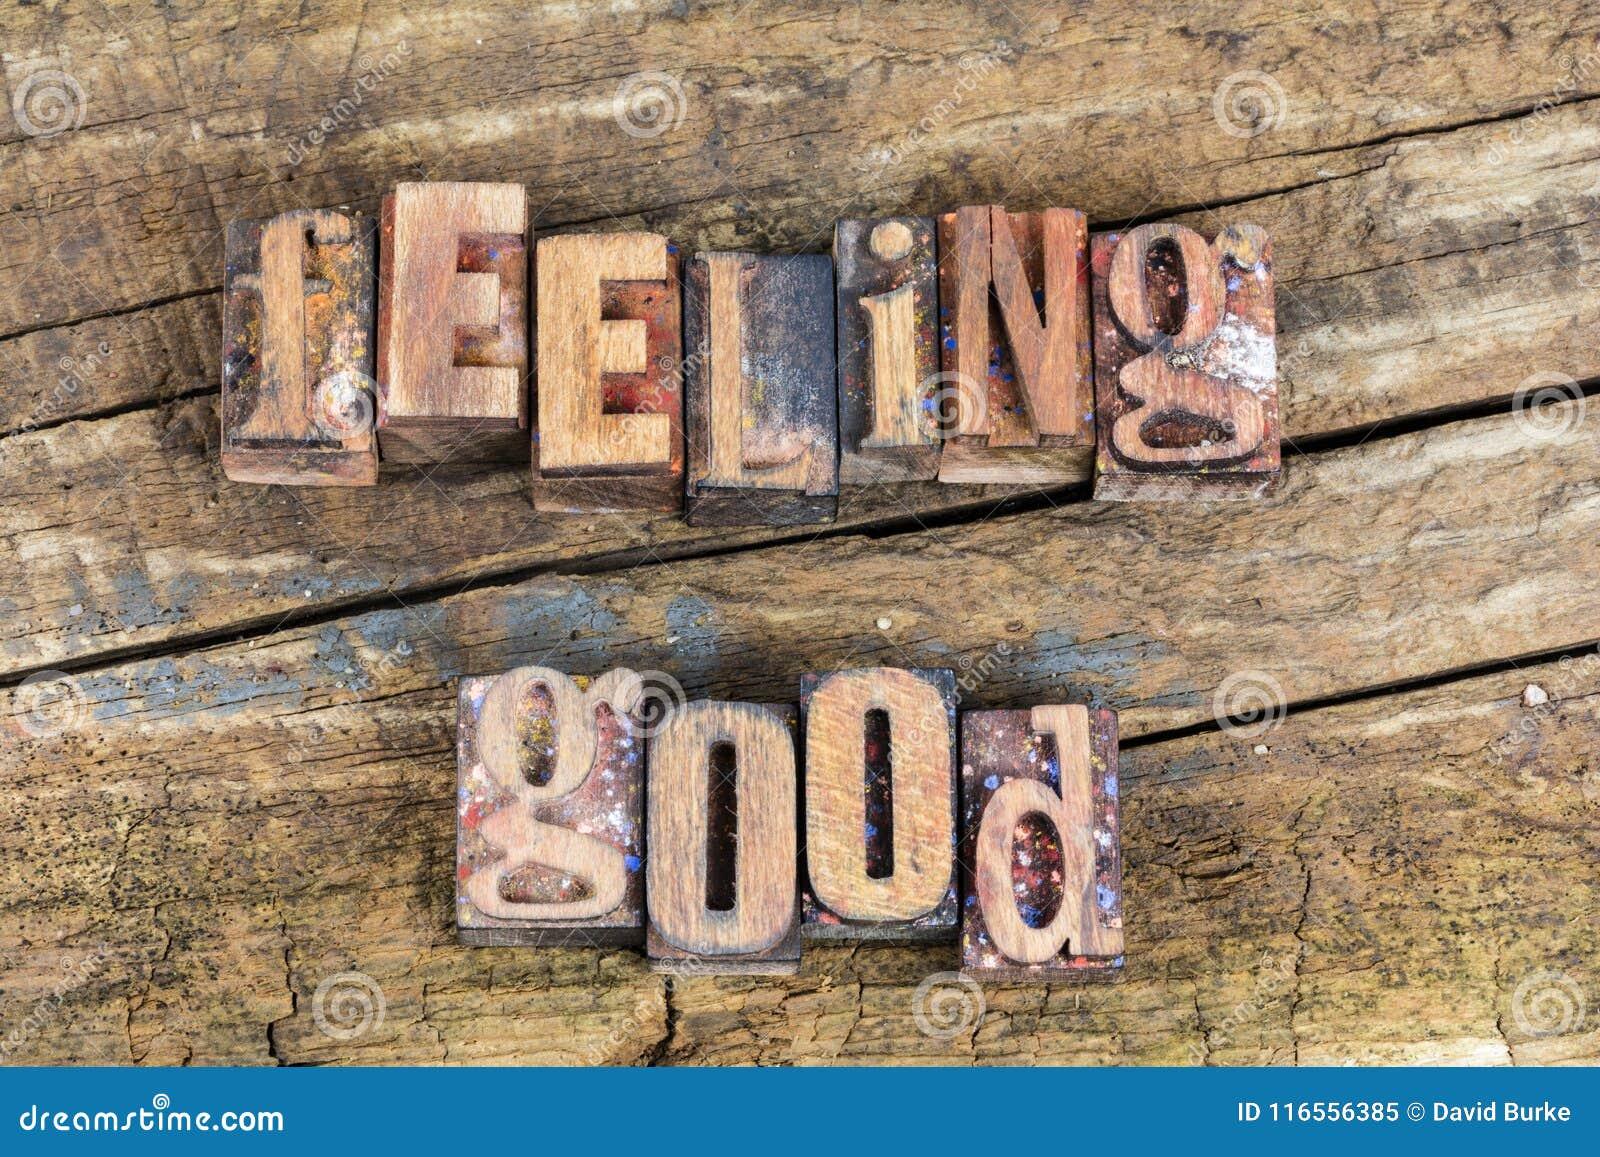 Feeling good positive attitude letterpress